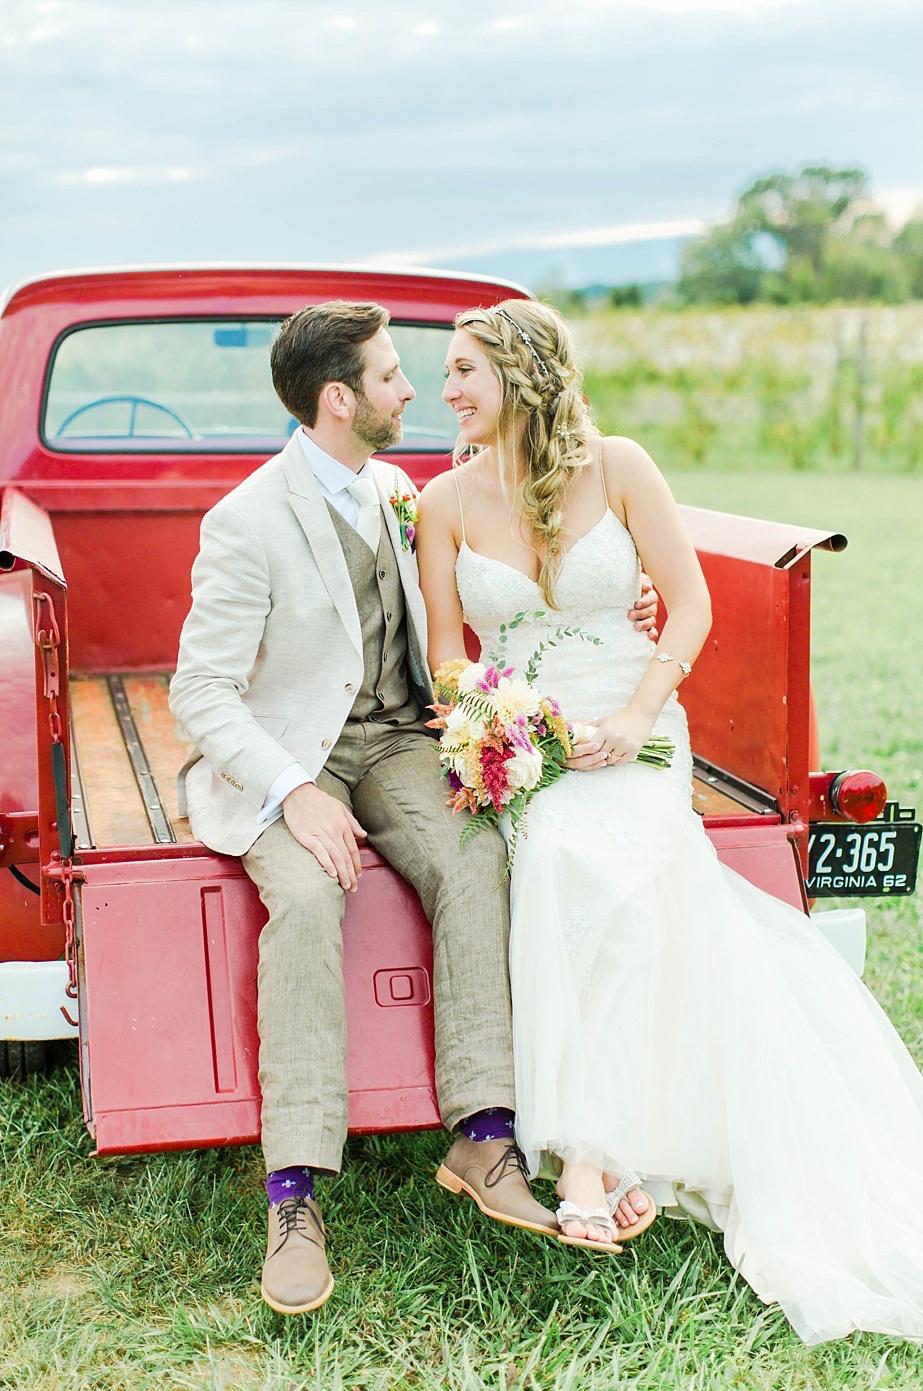 Jessica + Blake on September 16, 2017 ♥ Emily Sacra Photography Faithbrooke Barn & Vineyard (Luray,VA)